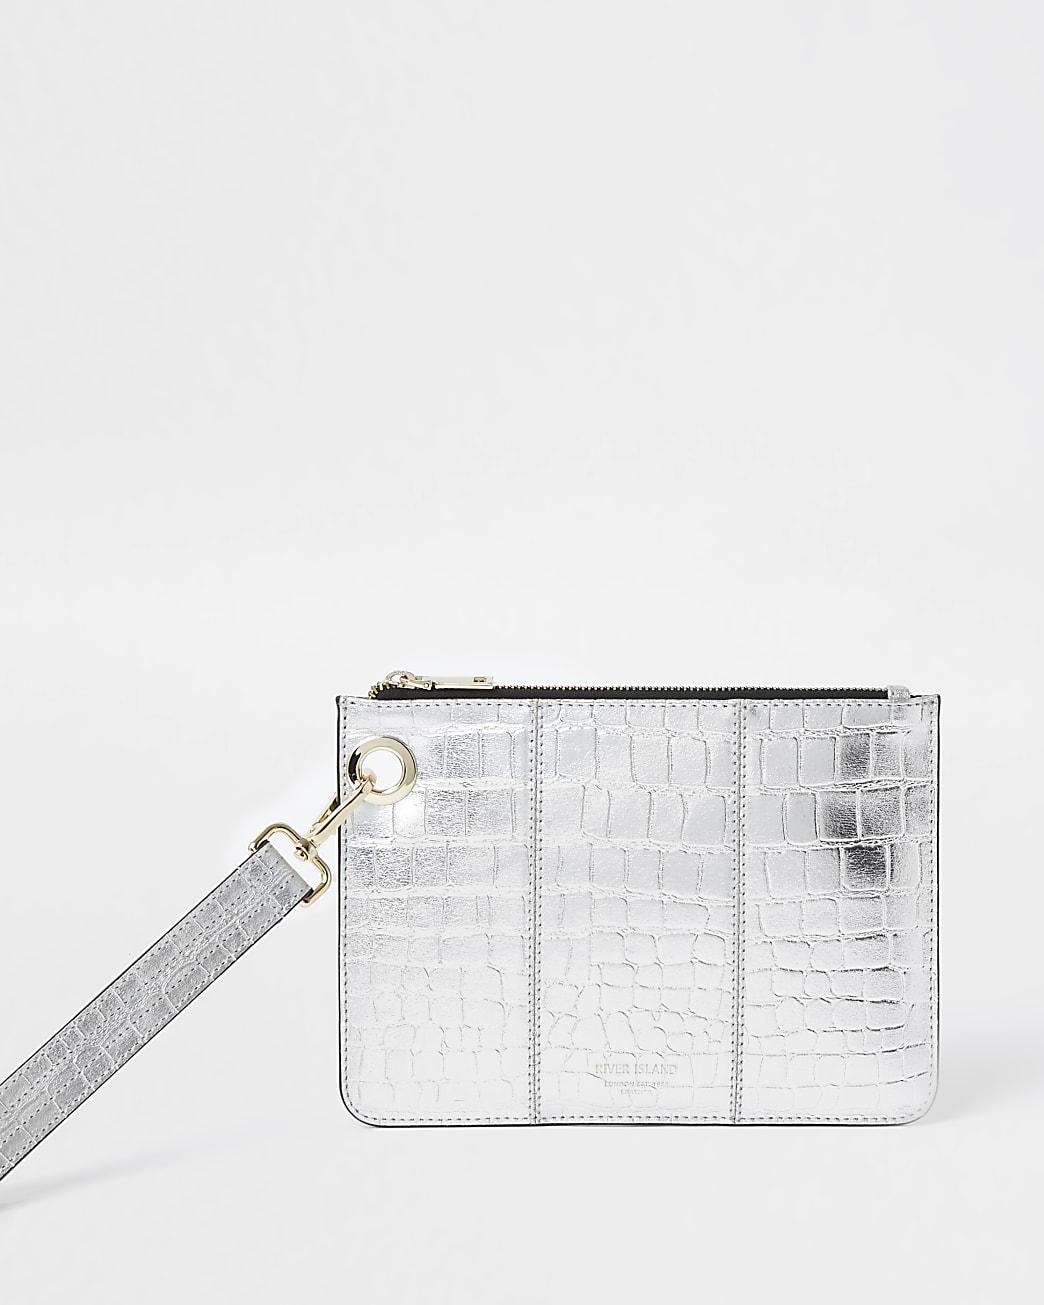 Silver leather croc embossed clutch handbag